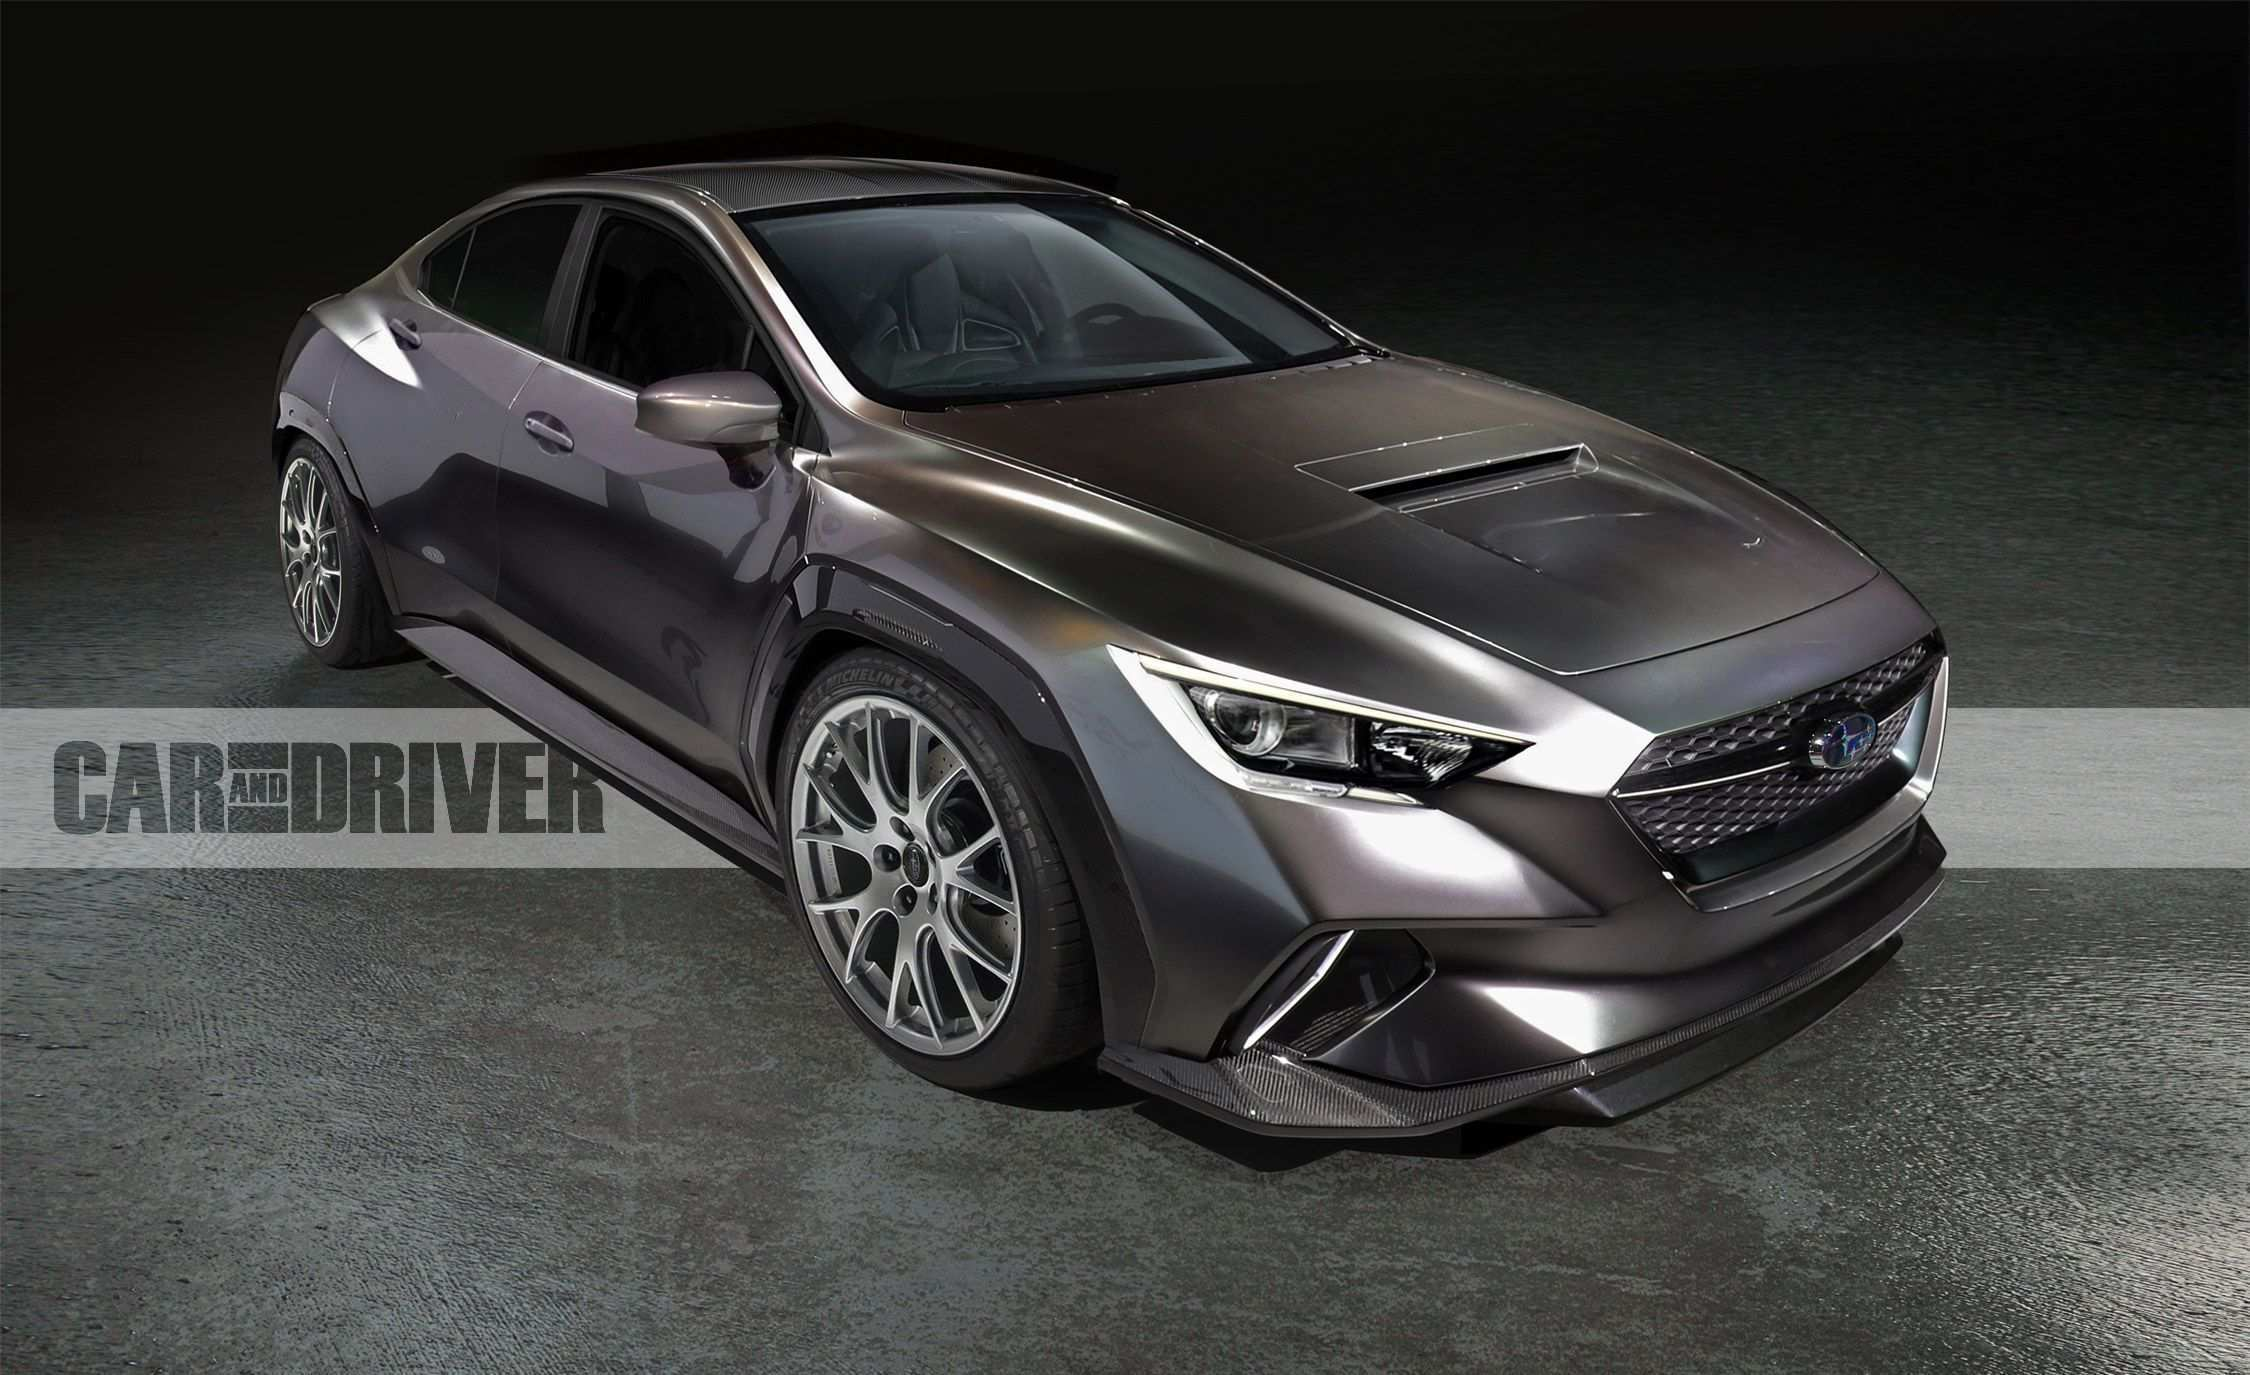 76 Concept of Subaru Lineup 2020 Reviews with Subaru Lineup 2020